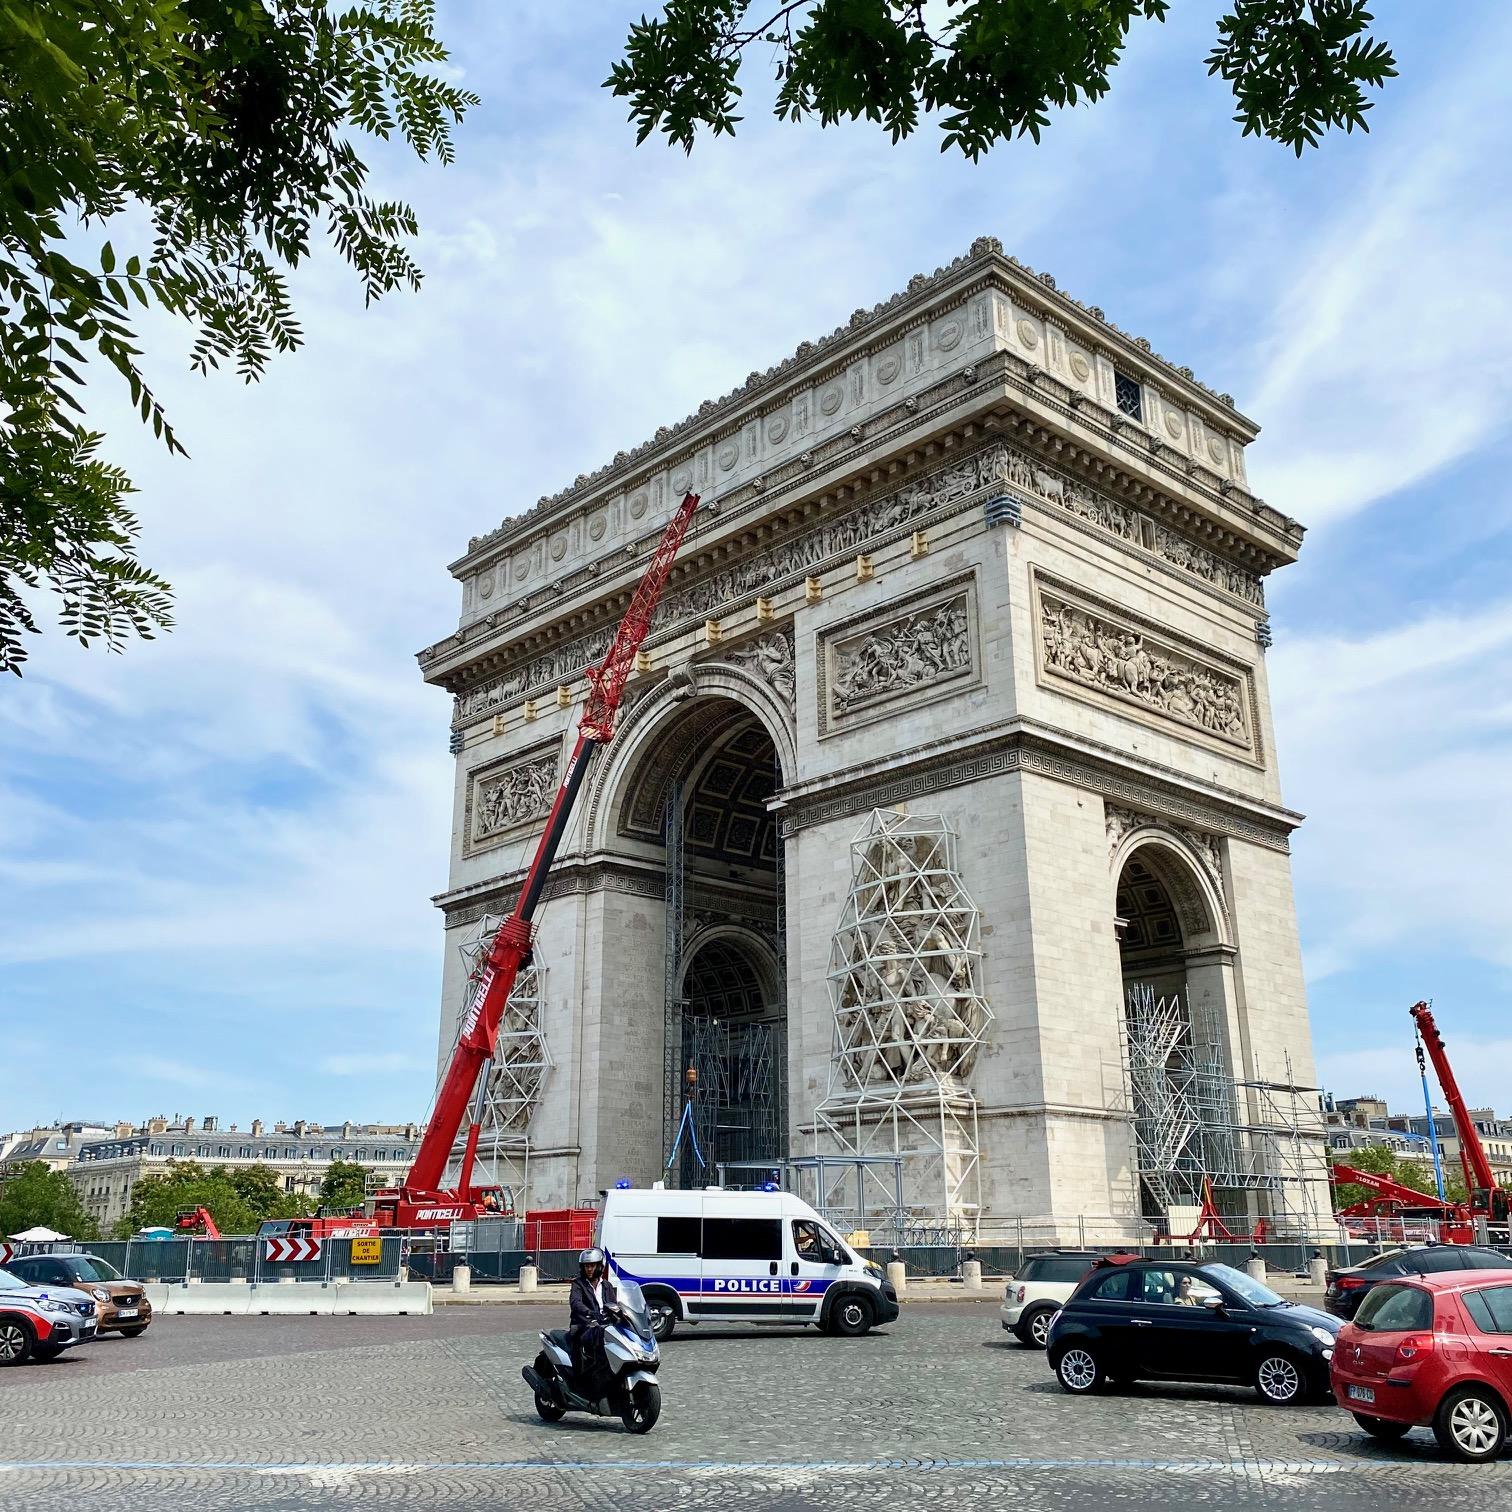 The Arc de Triomphe, Wrapped